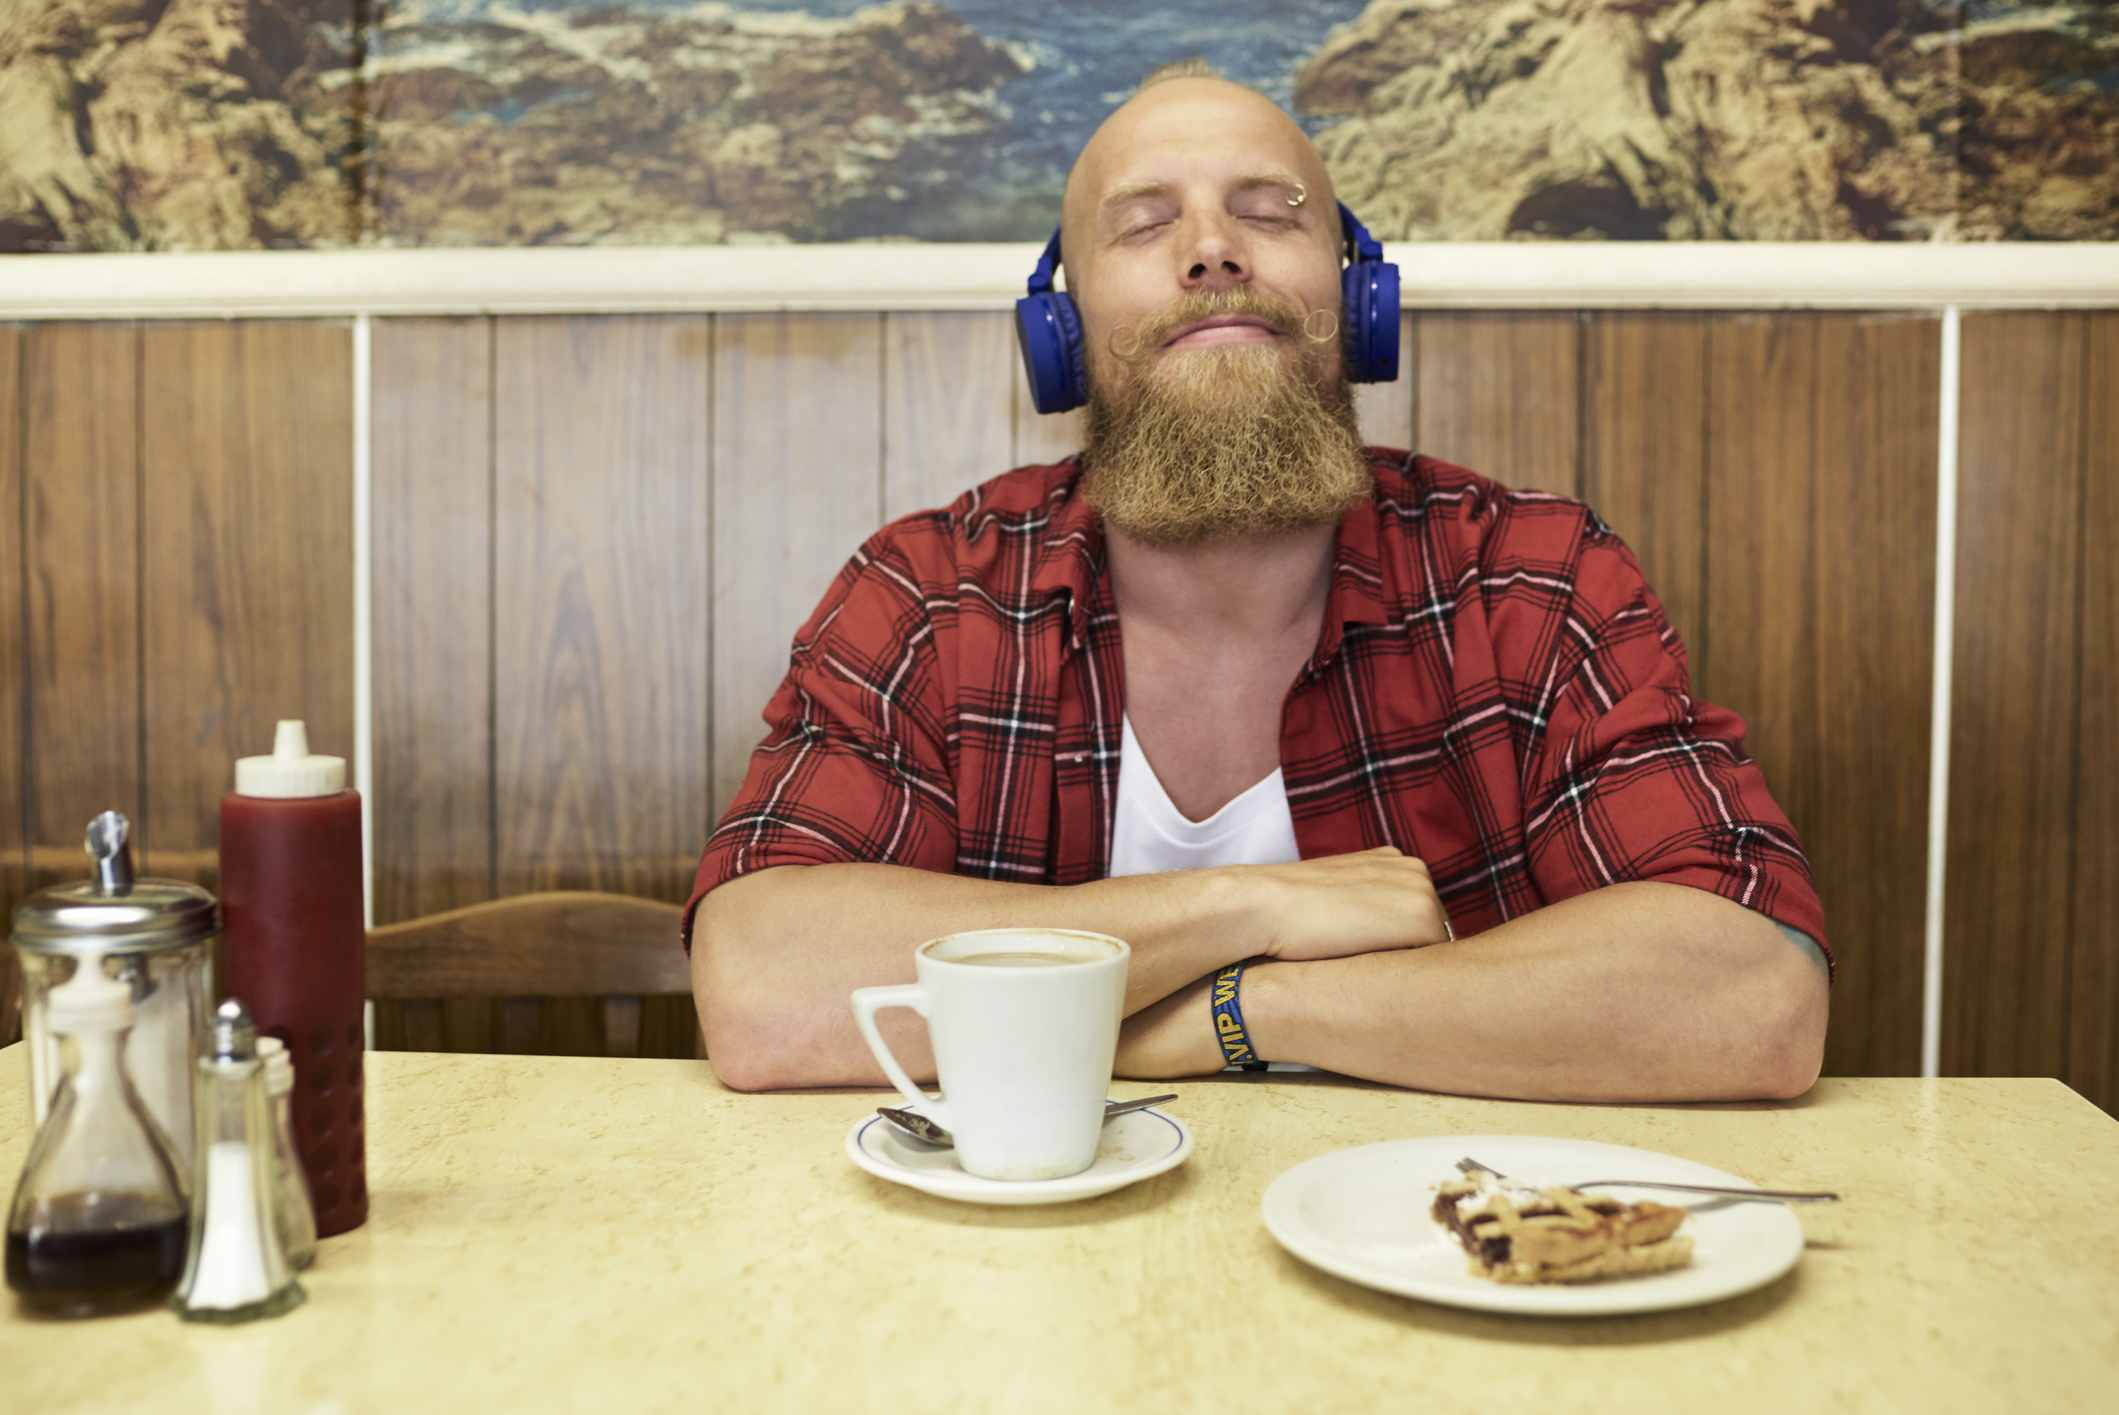 Man listening to wireless headphones in cafe